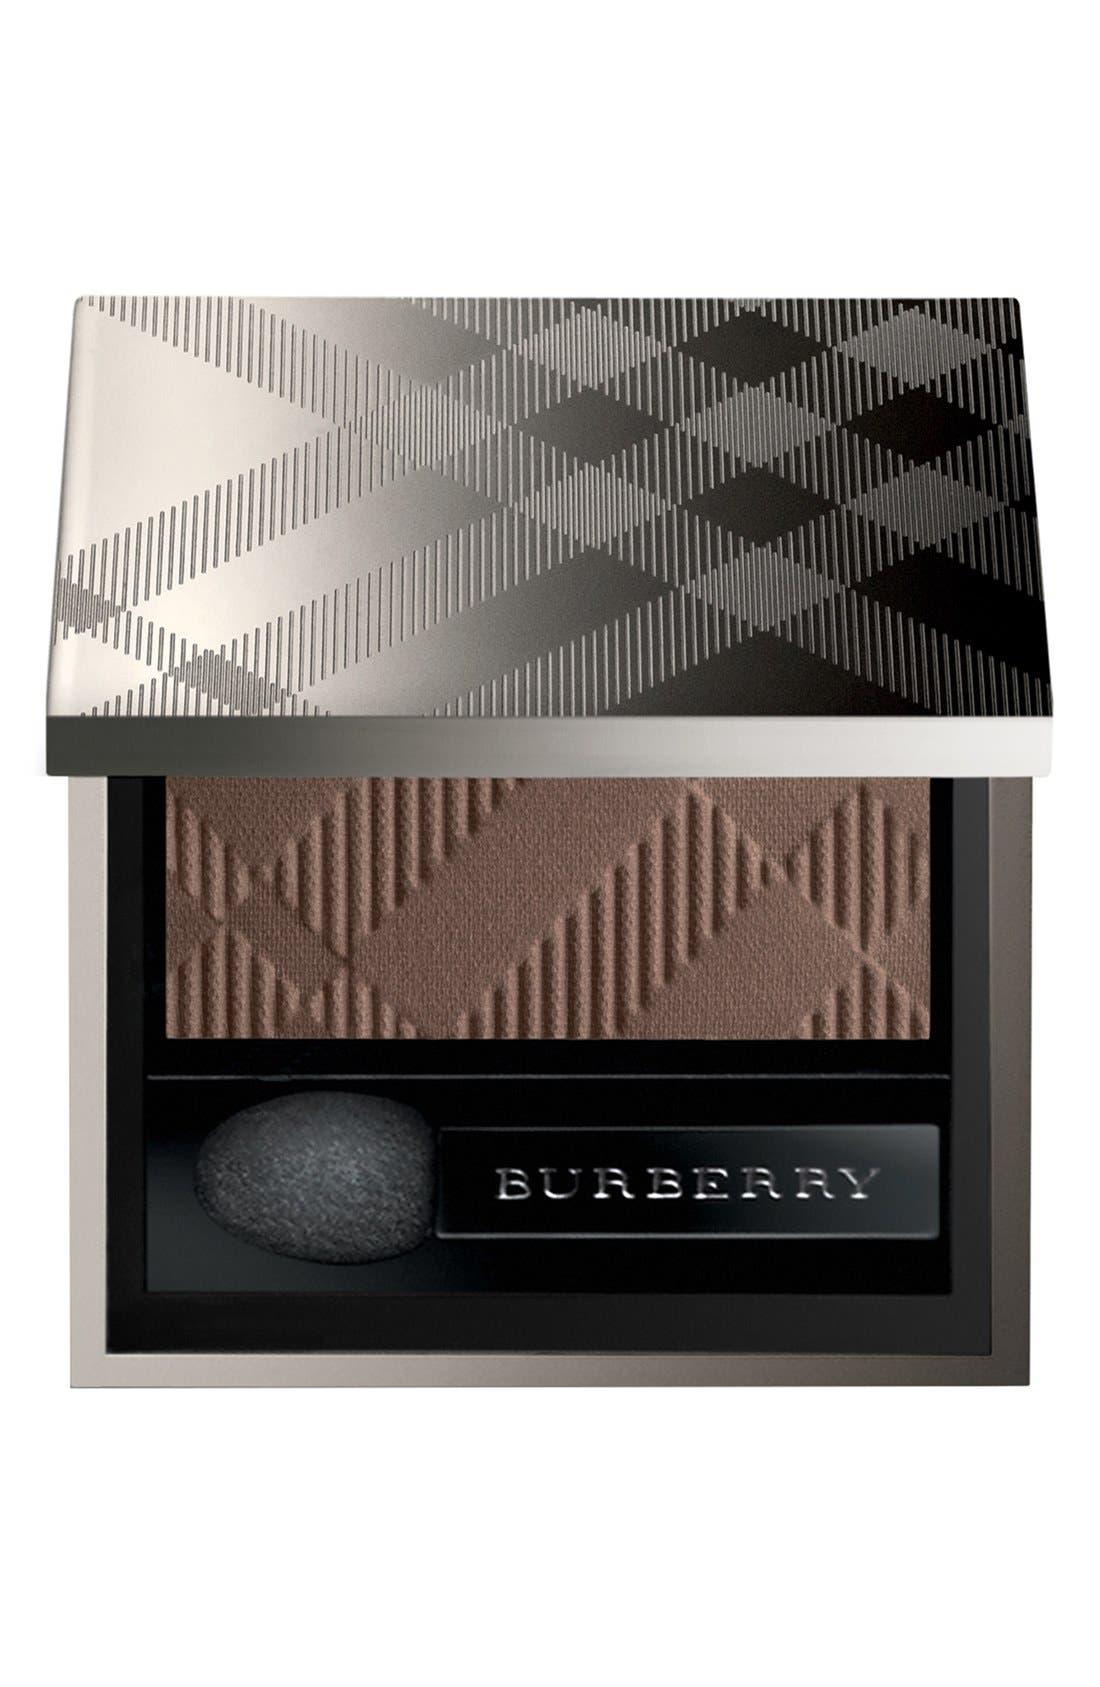 Burberry Beauty 'Eye Colour - Wet & Dry Silk' Eyeshadow